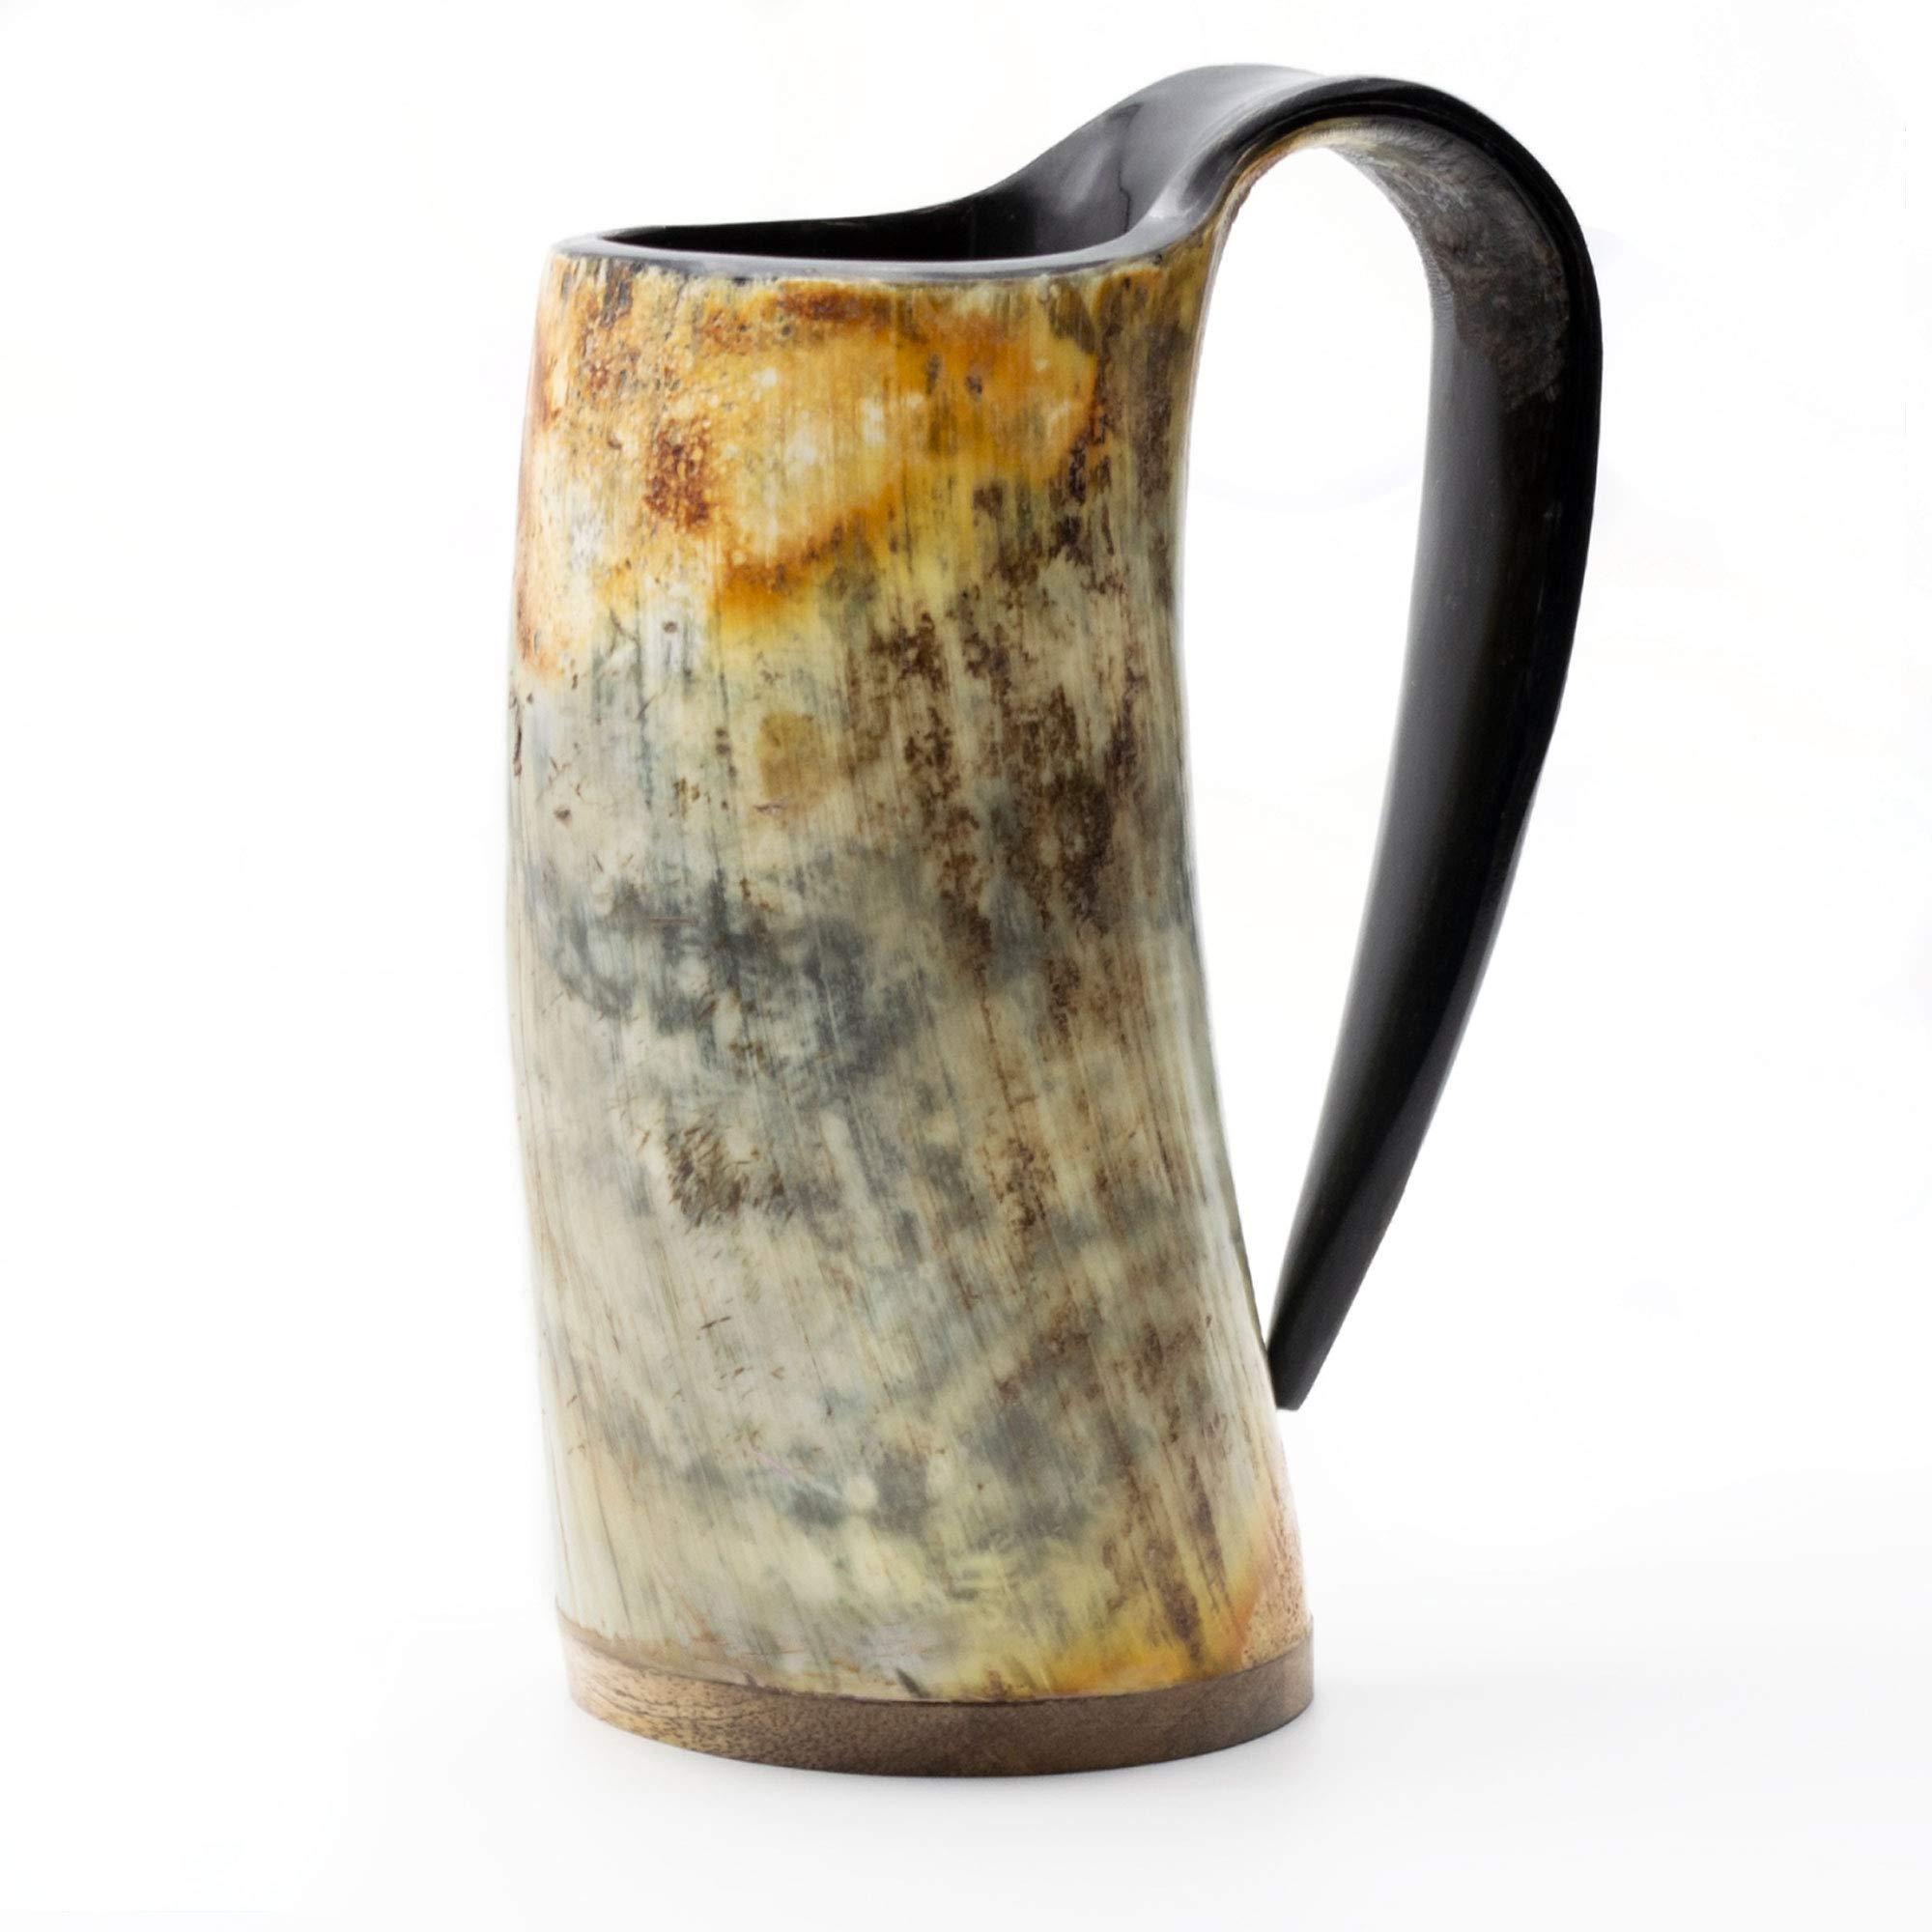 Norse Tradesman Original Viking Drinking Horn Mug - 100% Authentic Beer Horn Tankard w/Natural Surface & Burlap Gift Sack |''The Original'', Unpolished, Large